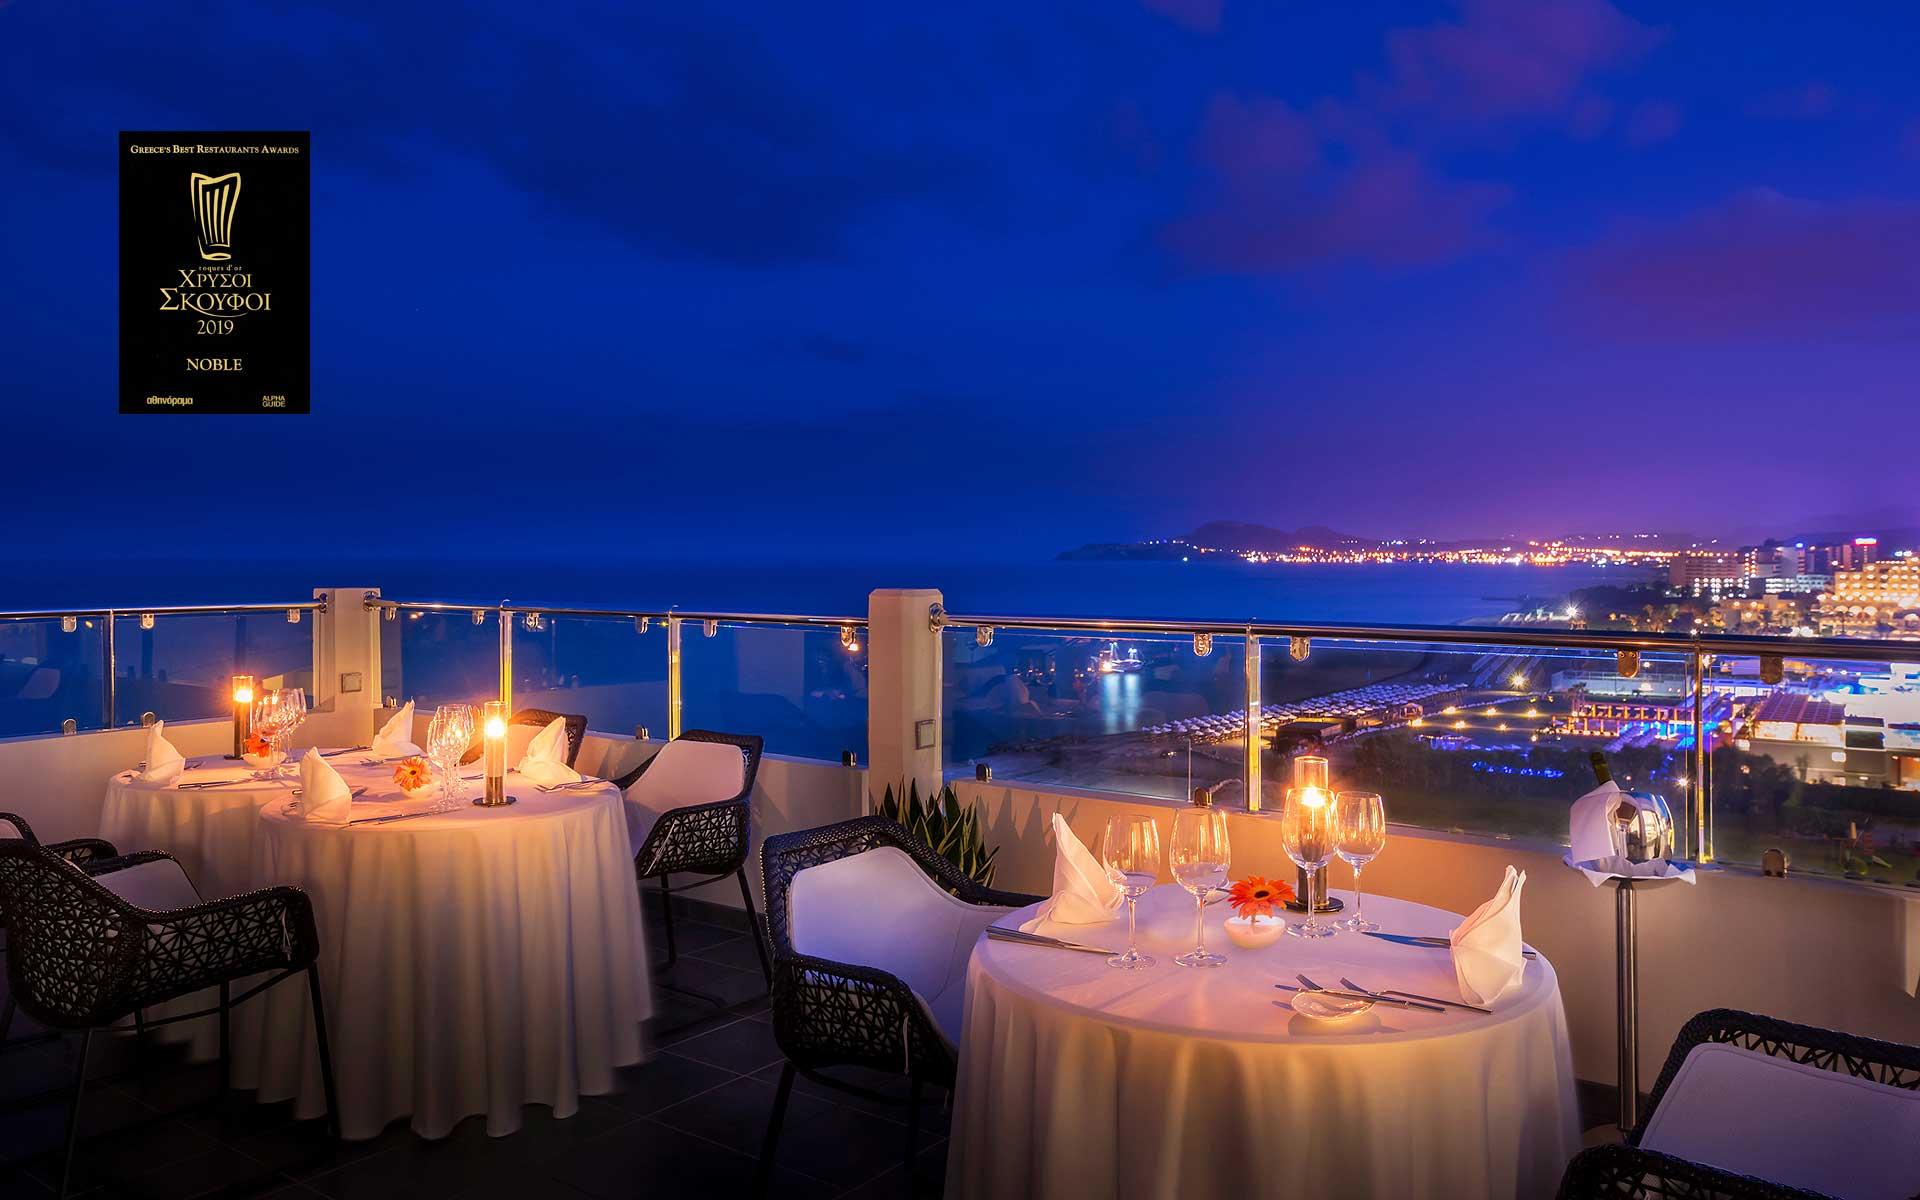 Noble_Gourmet_Restaurant_ELYSIUM_RHODES_AWARD_CAROUSEL